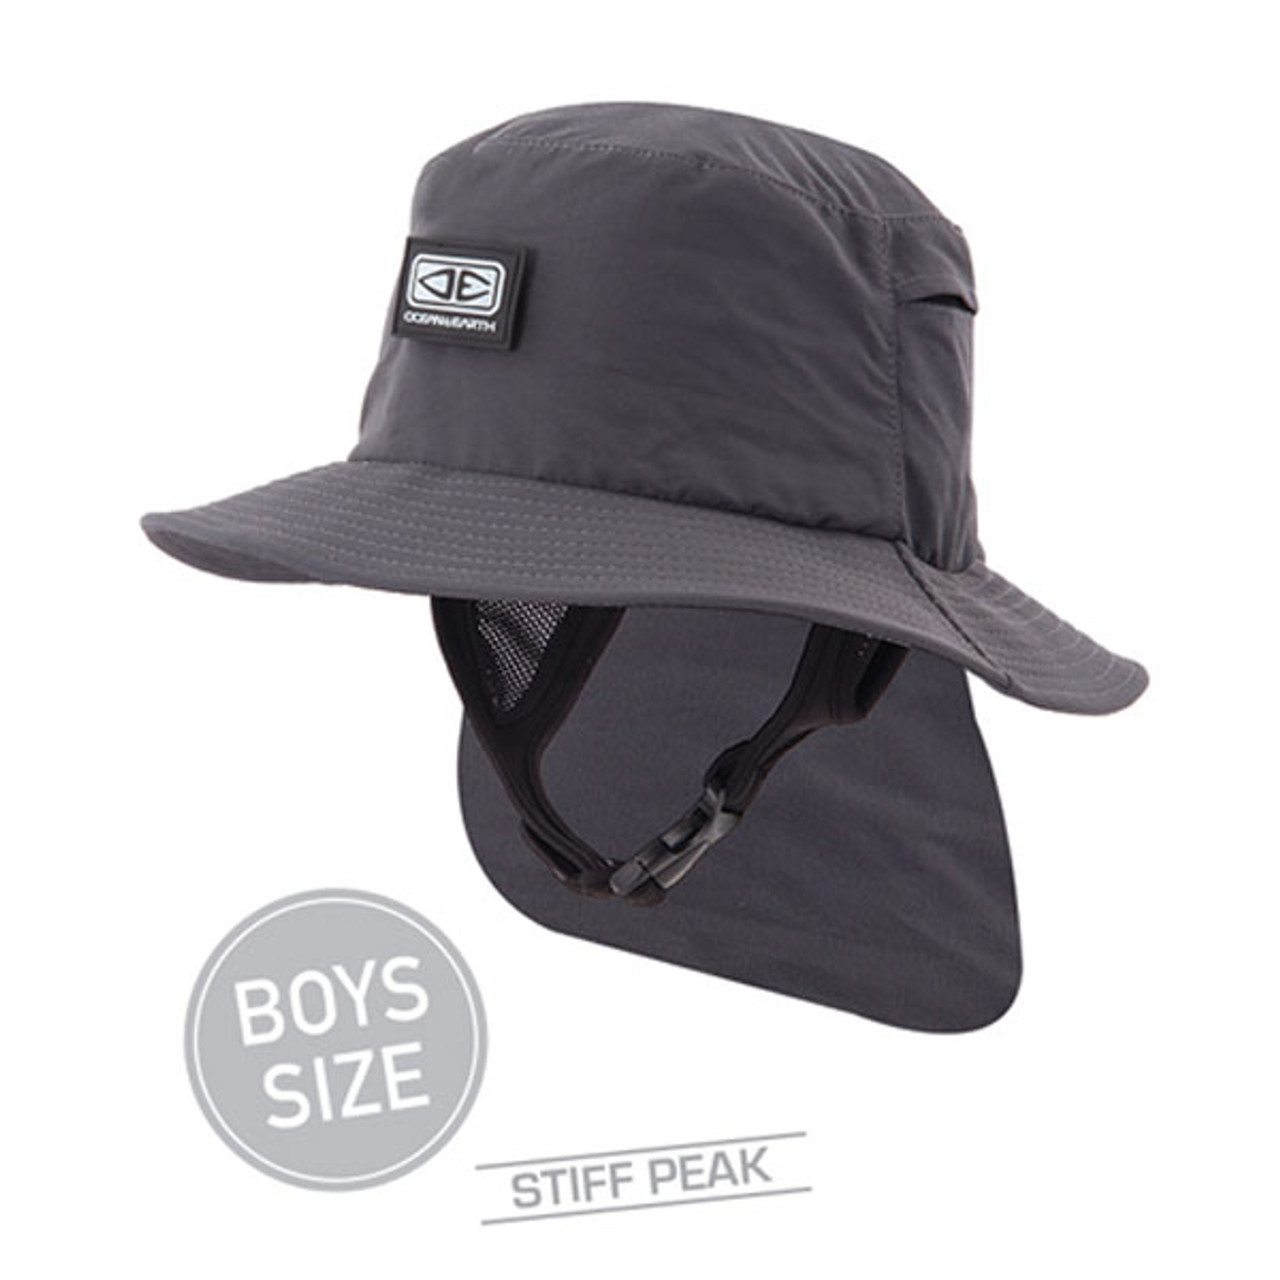 FAR KING H20 SURF CAP BLACK SURFING HAT